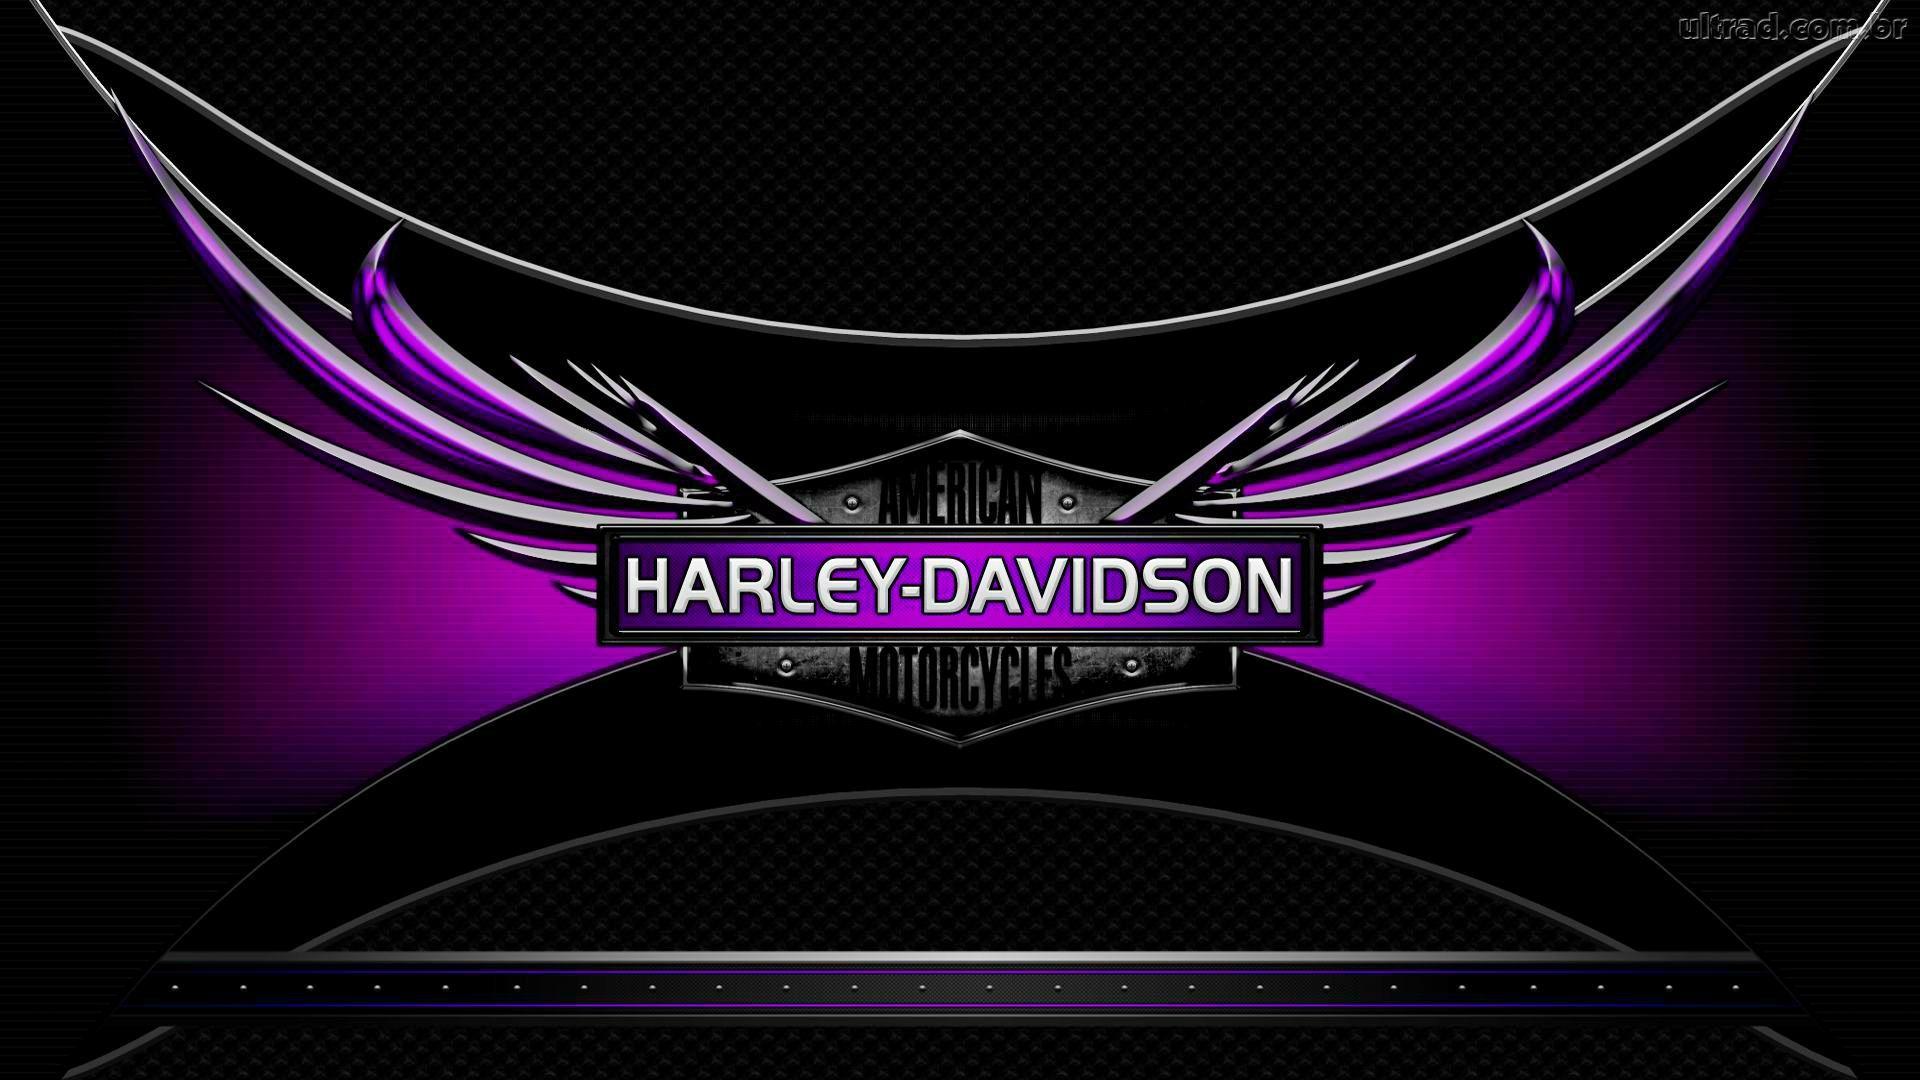 Hd cool harley davidson logo wallpapers hd desktop - Cool logo wallpapers ...